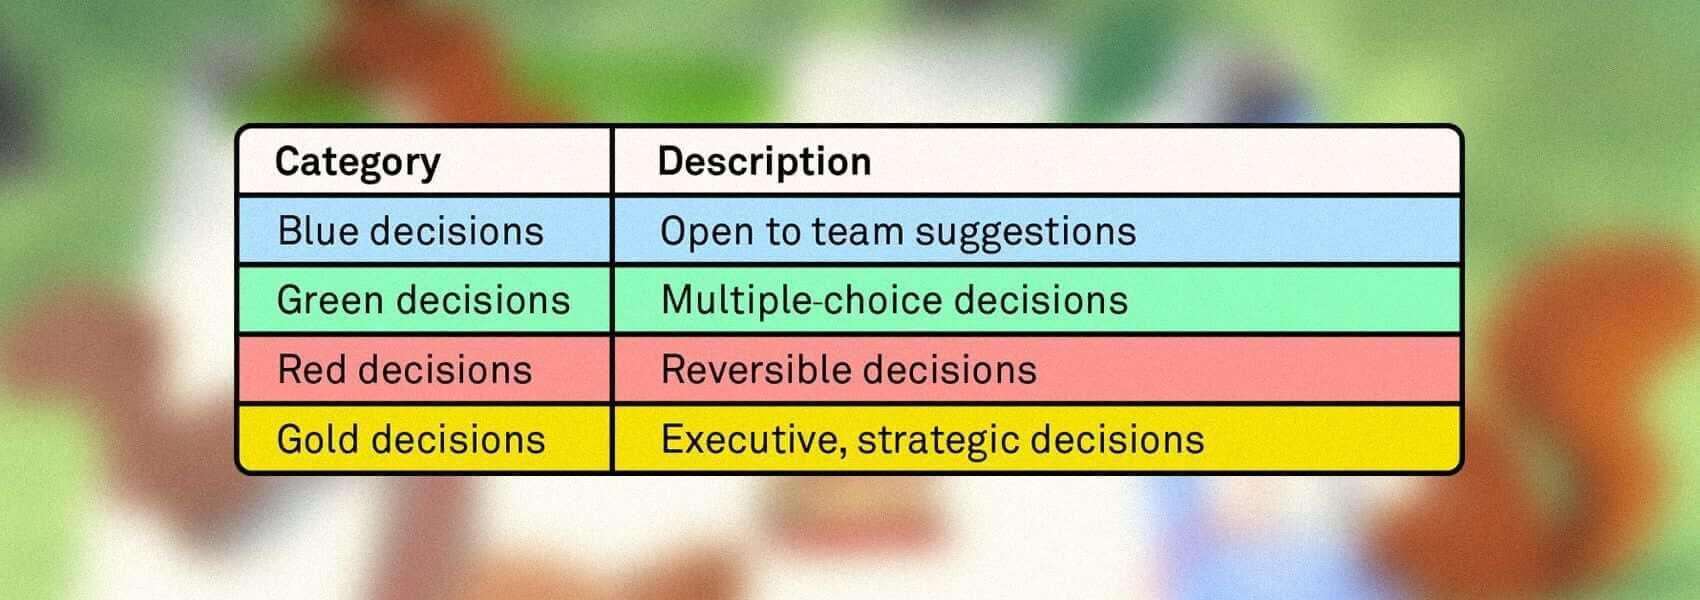 Intercom Customer Support decision-making framework